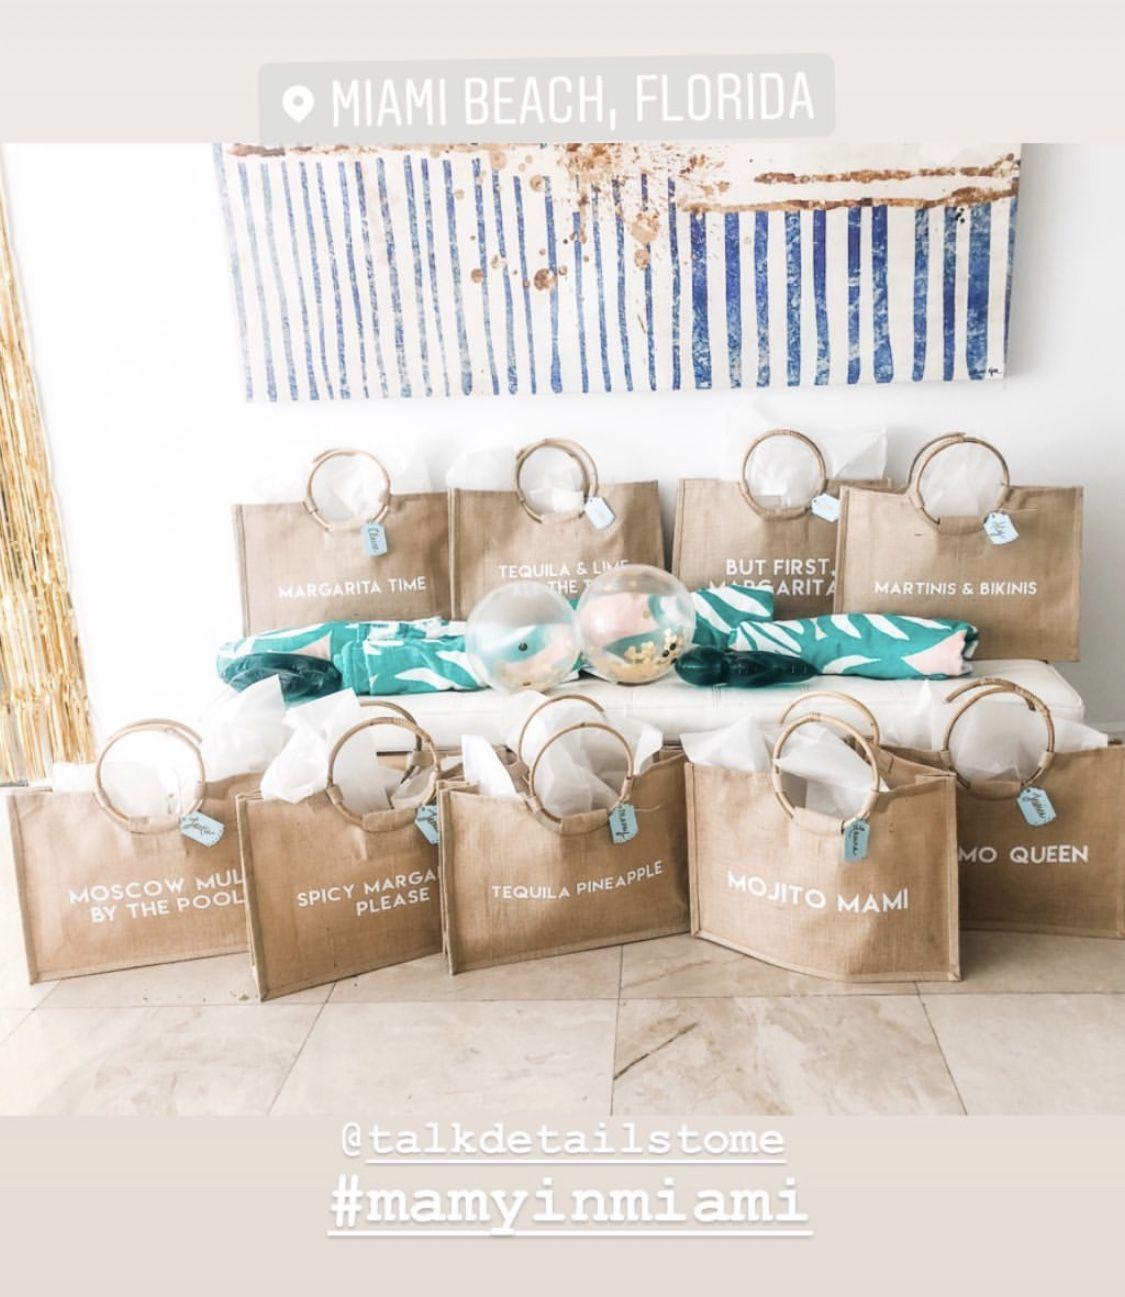 Destination Wedding Gift Ideas: Shop Customizable Beach Totes $25 USD • Free Shipping